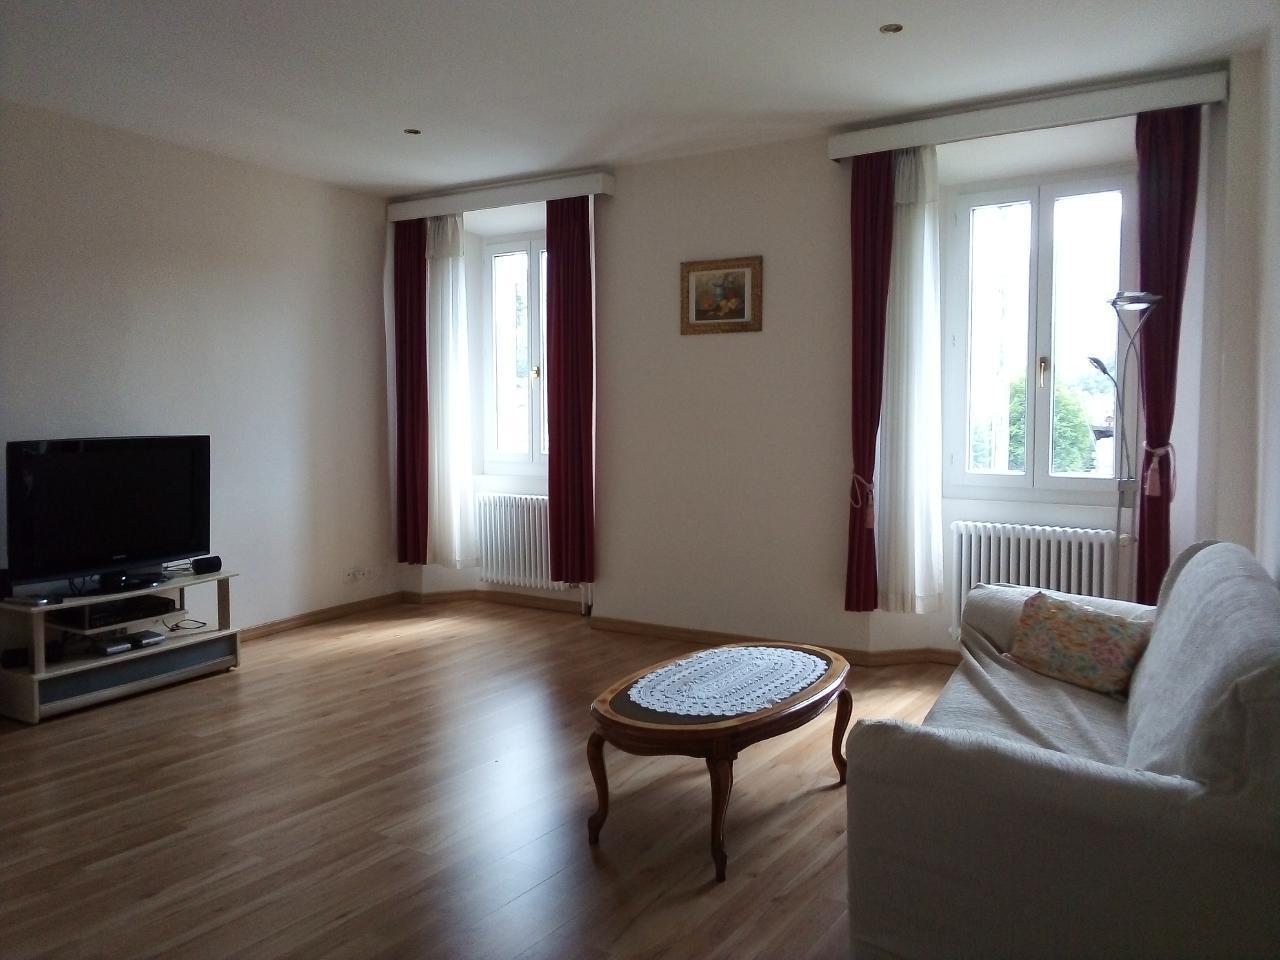 Appartement de vacances Grosszügige Wohnung im historischen Tessinerhaus (2617724), Sessa, Lac de Lugano (CH), Tessin, Suisse, image 1